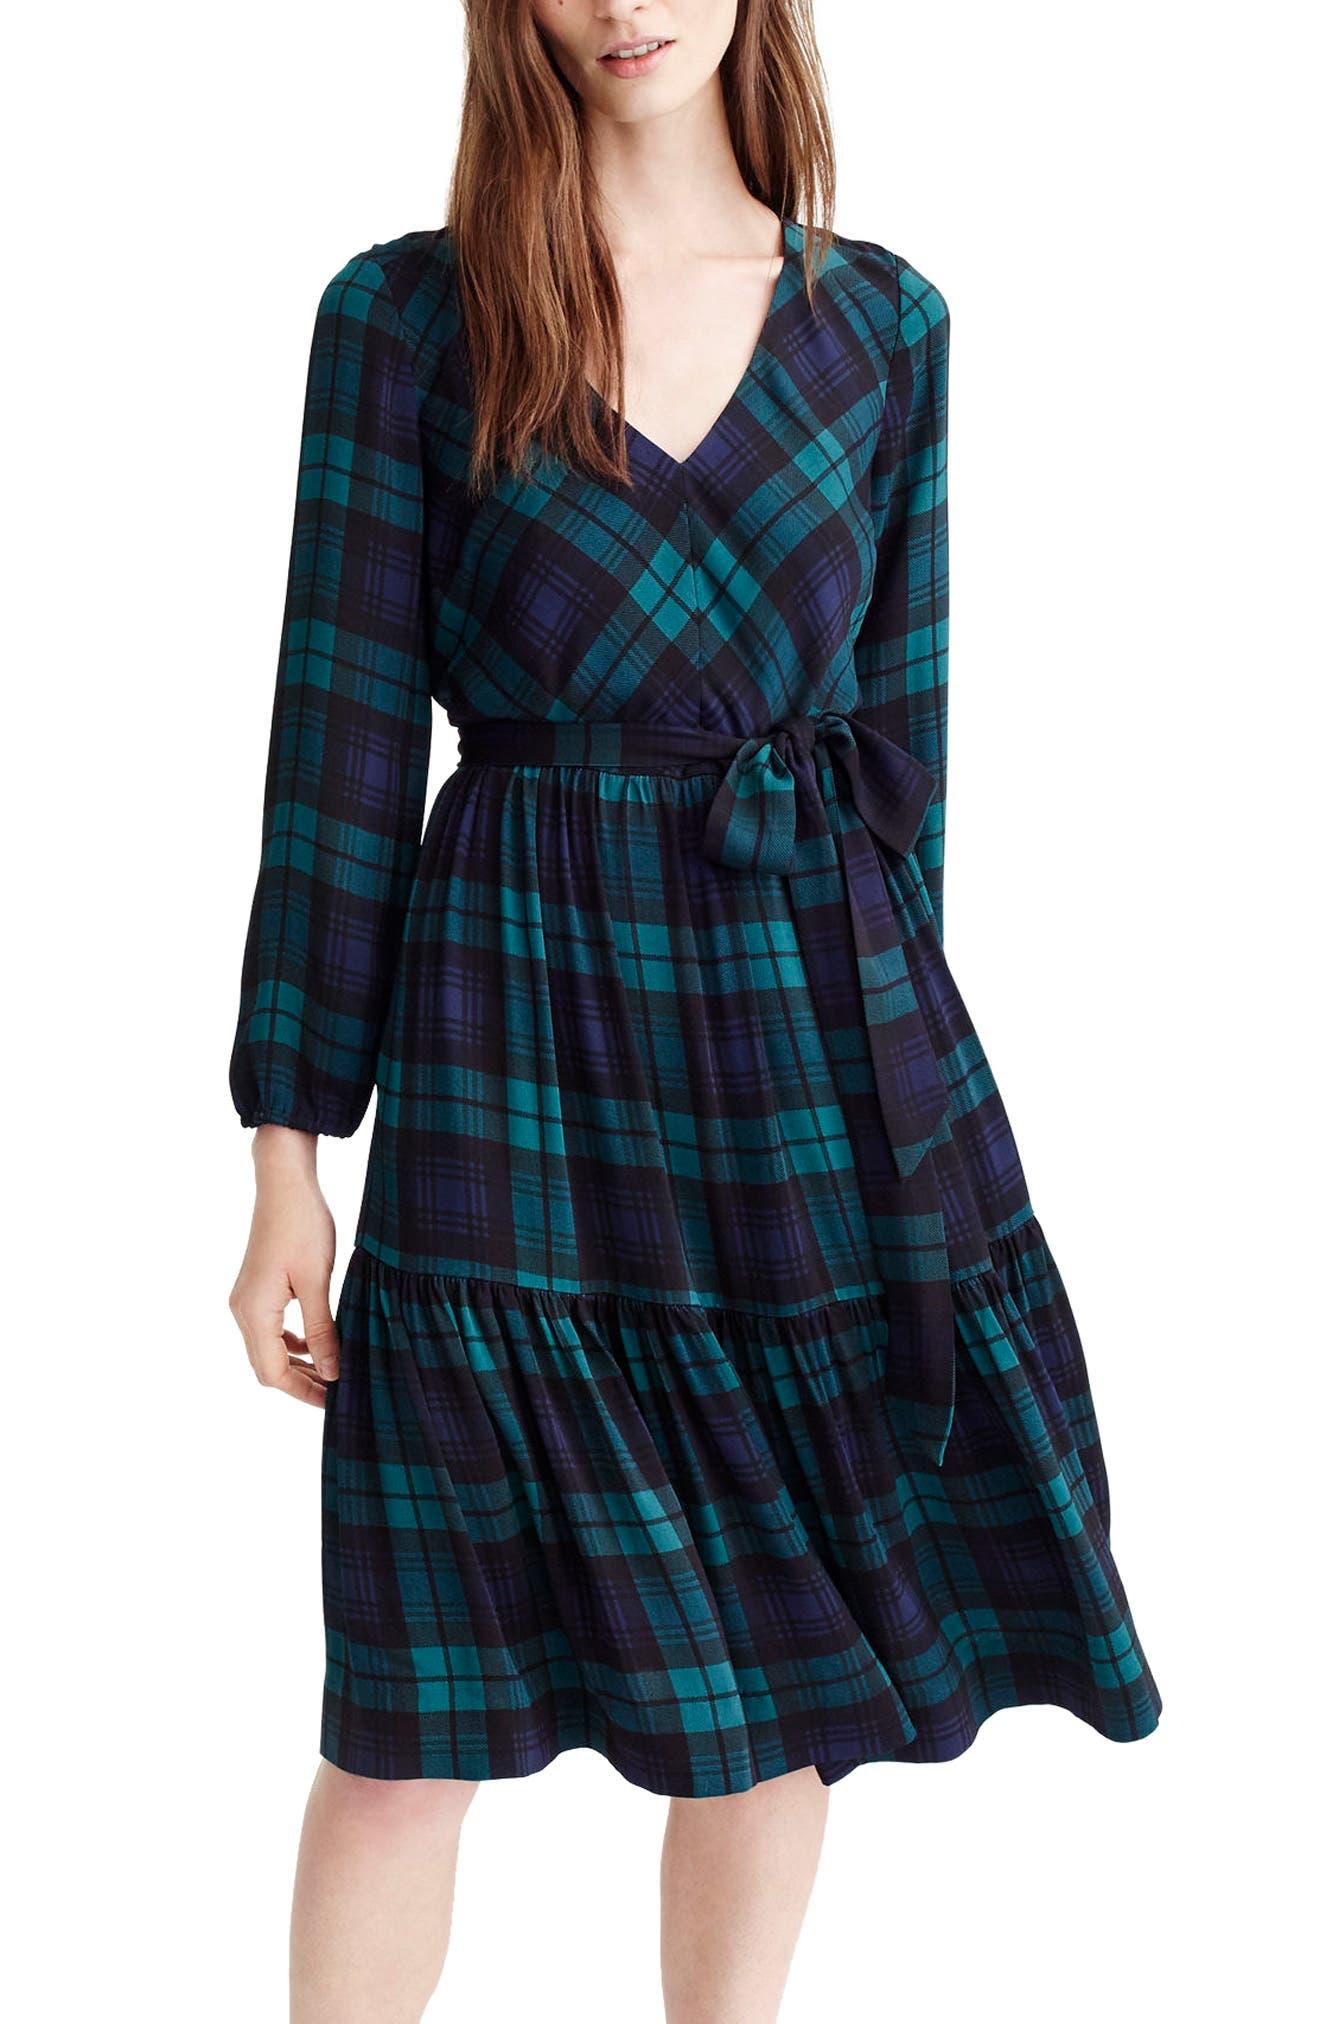 Drapey Dress in Black Watch Plaid,                             Main thumbnail 1, color,